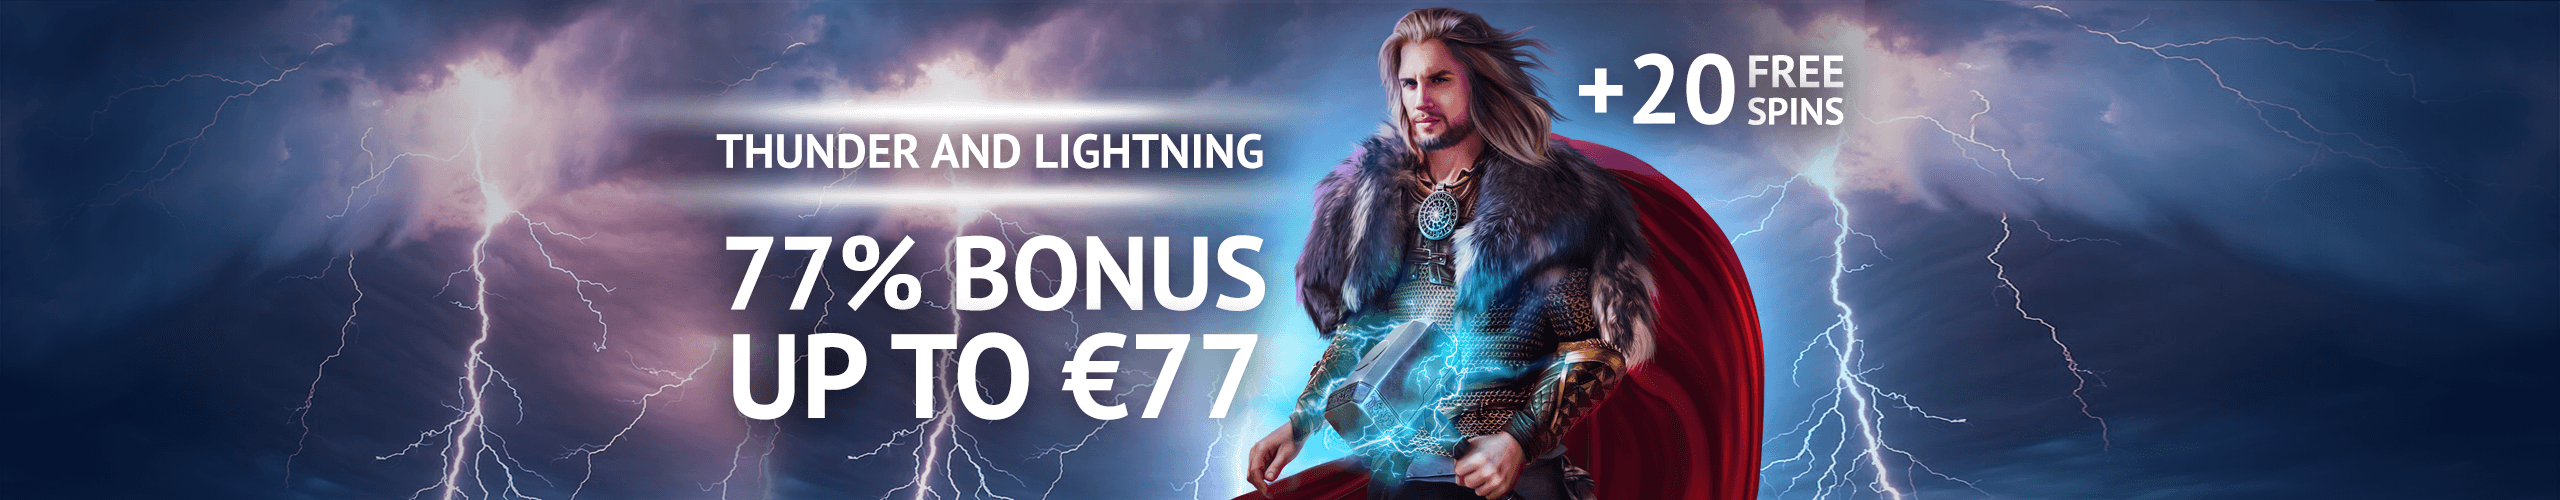 Thunderstorm Bonus